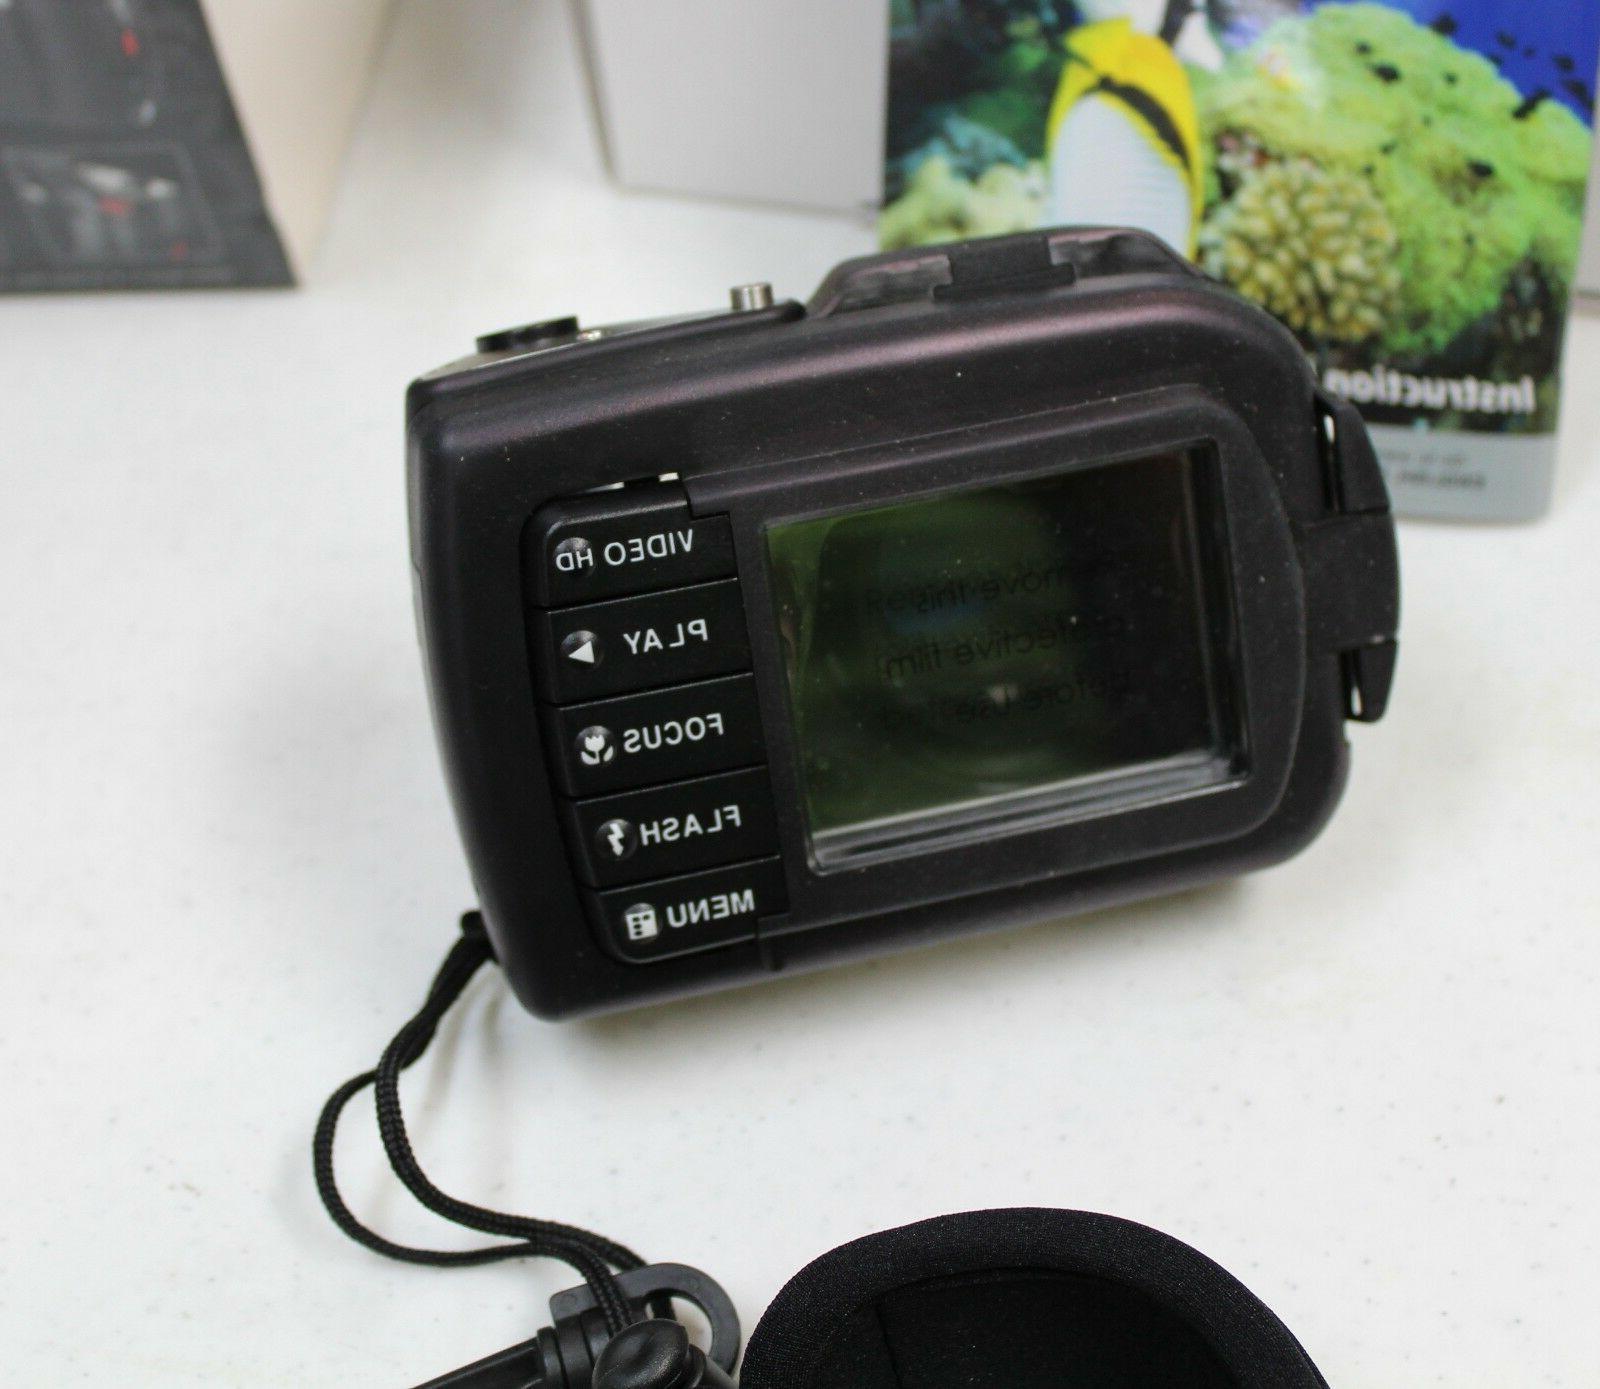 Sealife DC1400 Camera Case